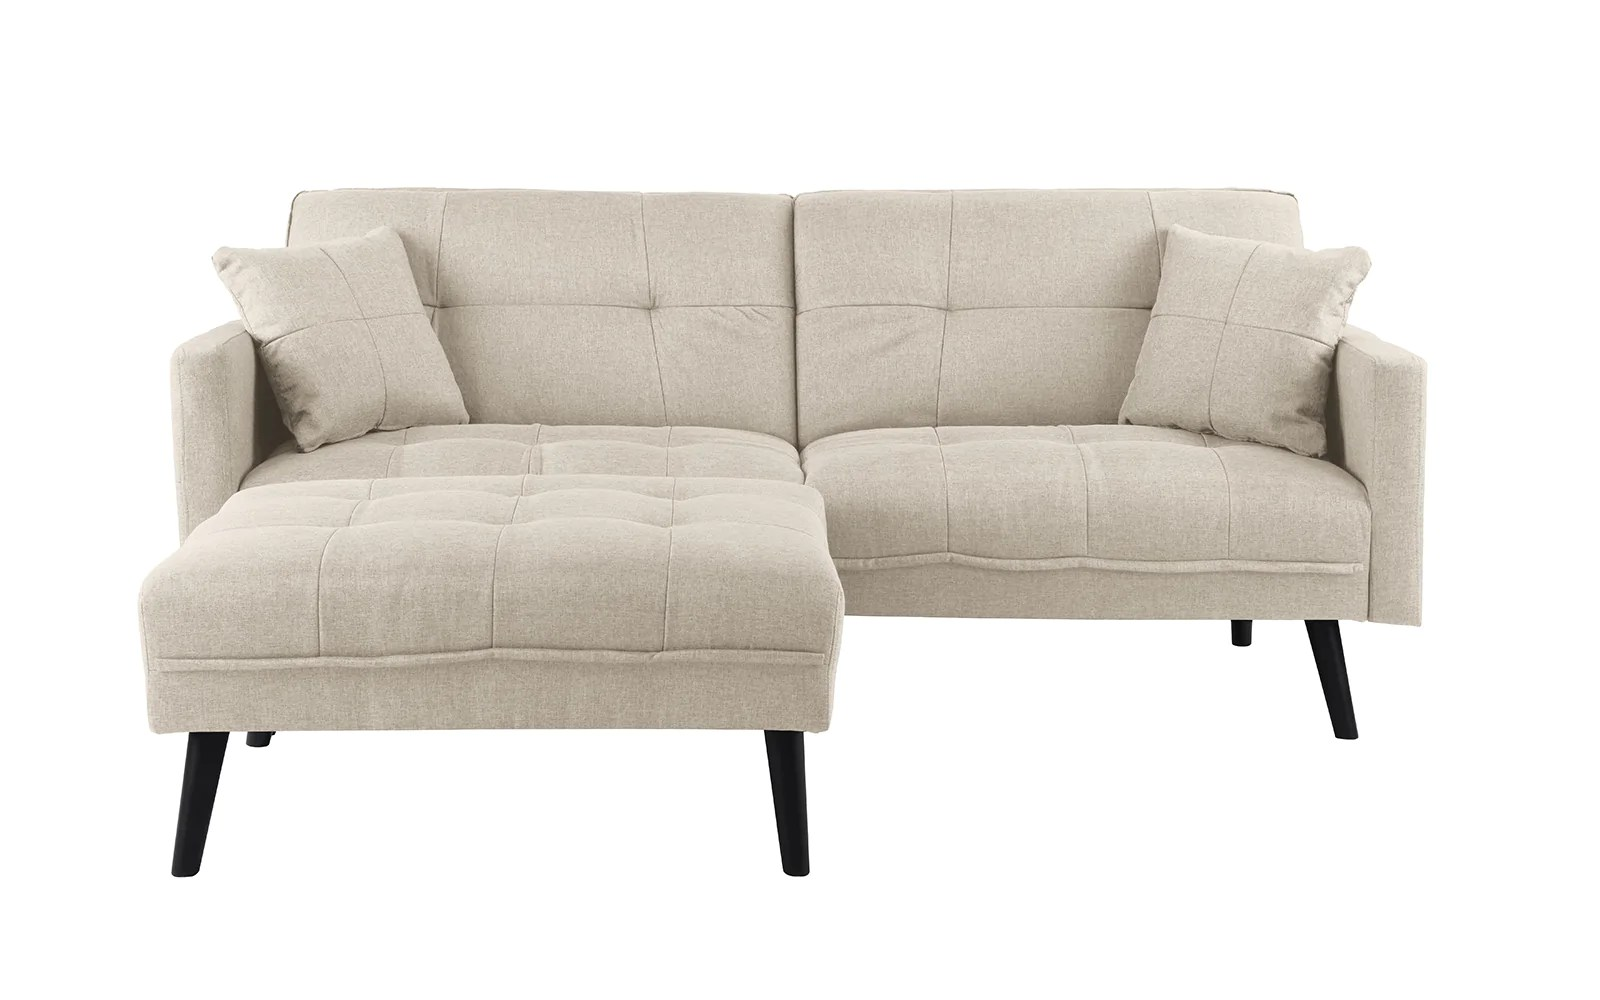 berwick mid century sleeper sofa dania chaise madison linen sofamania